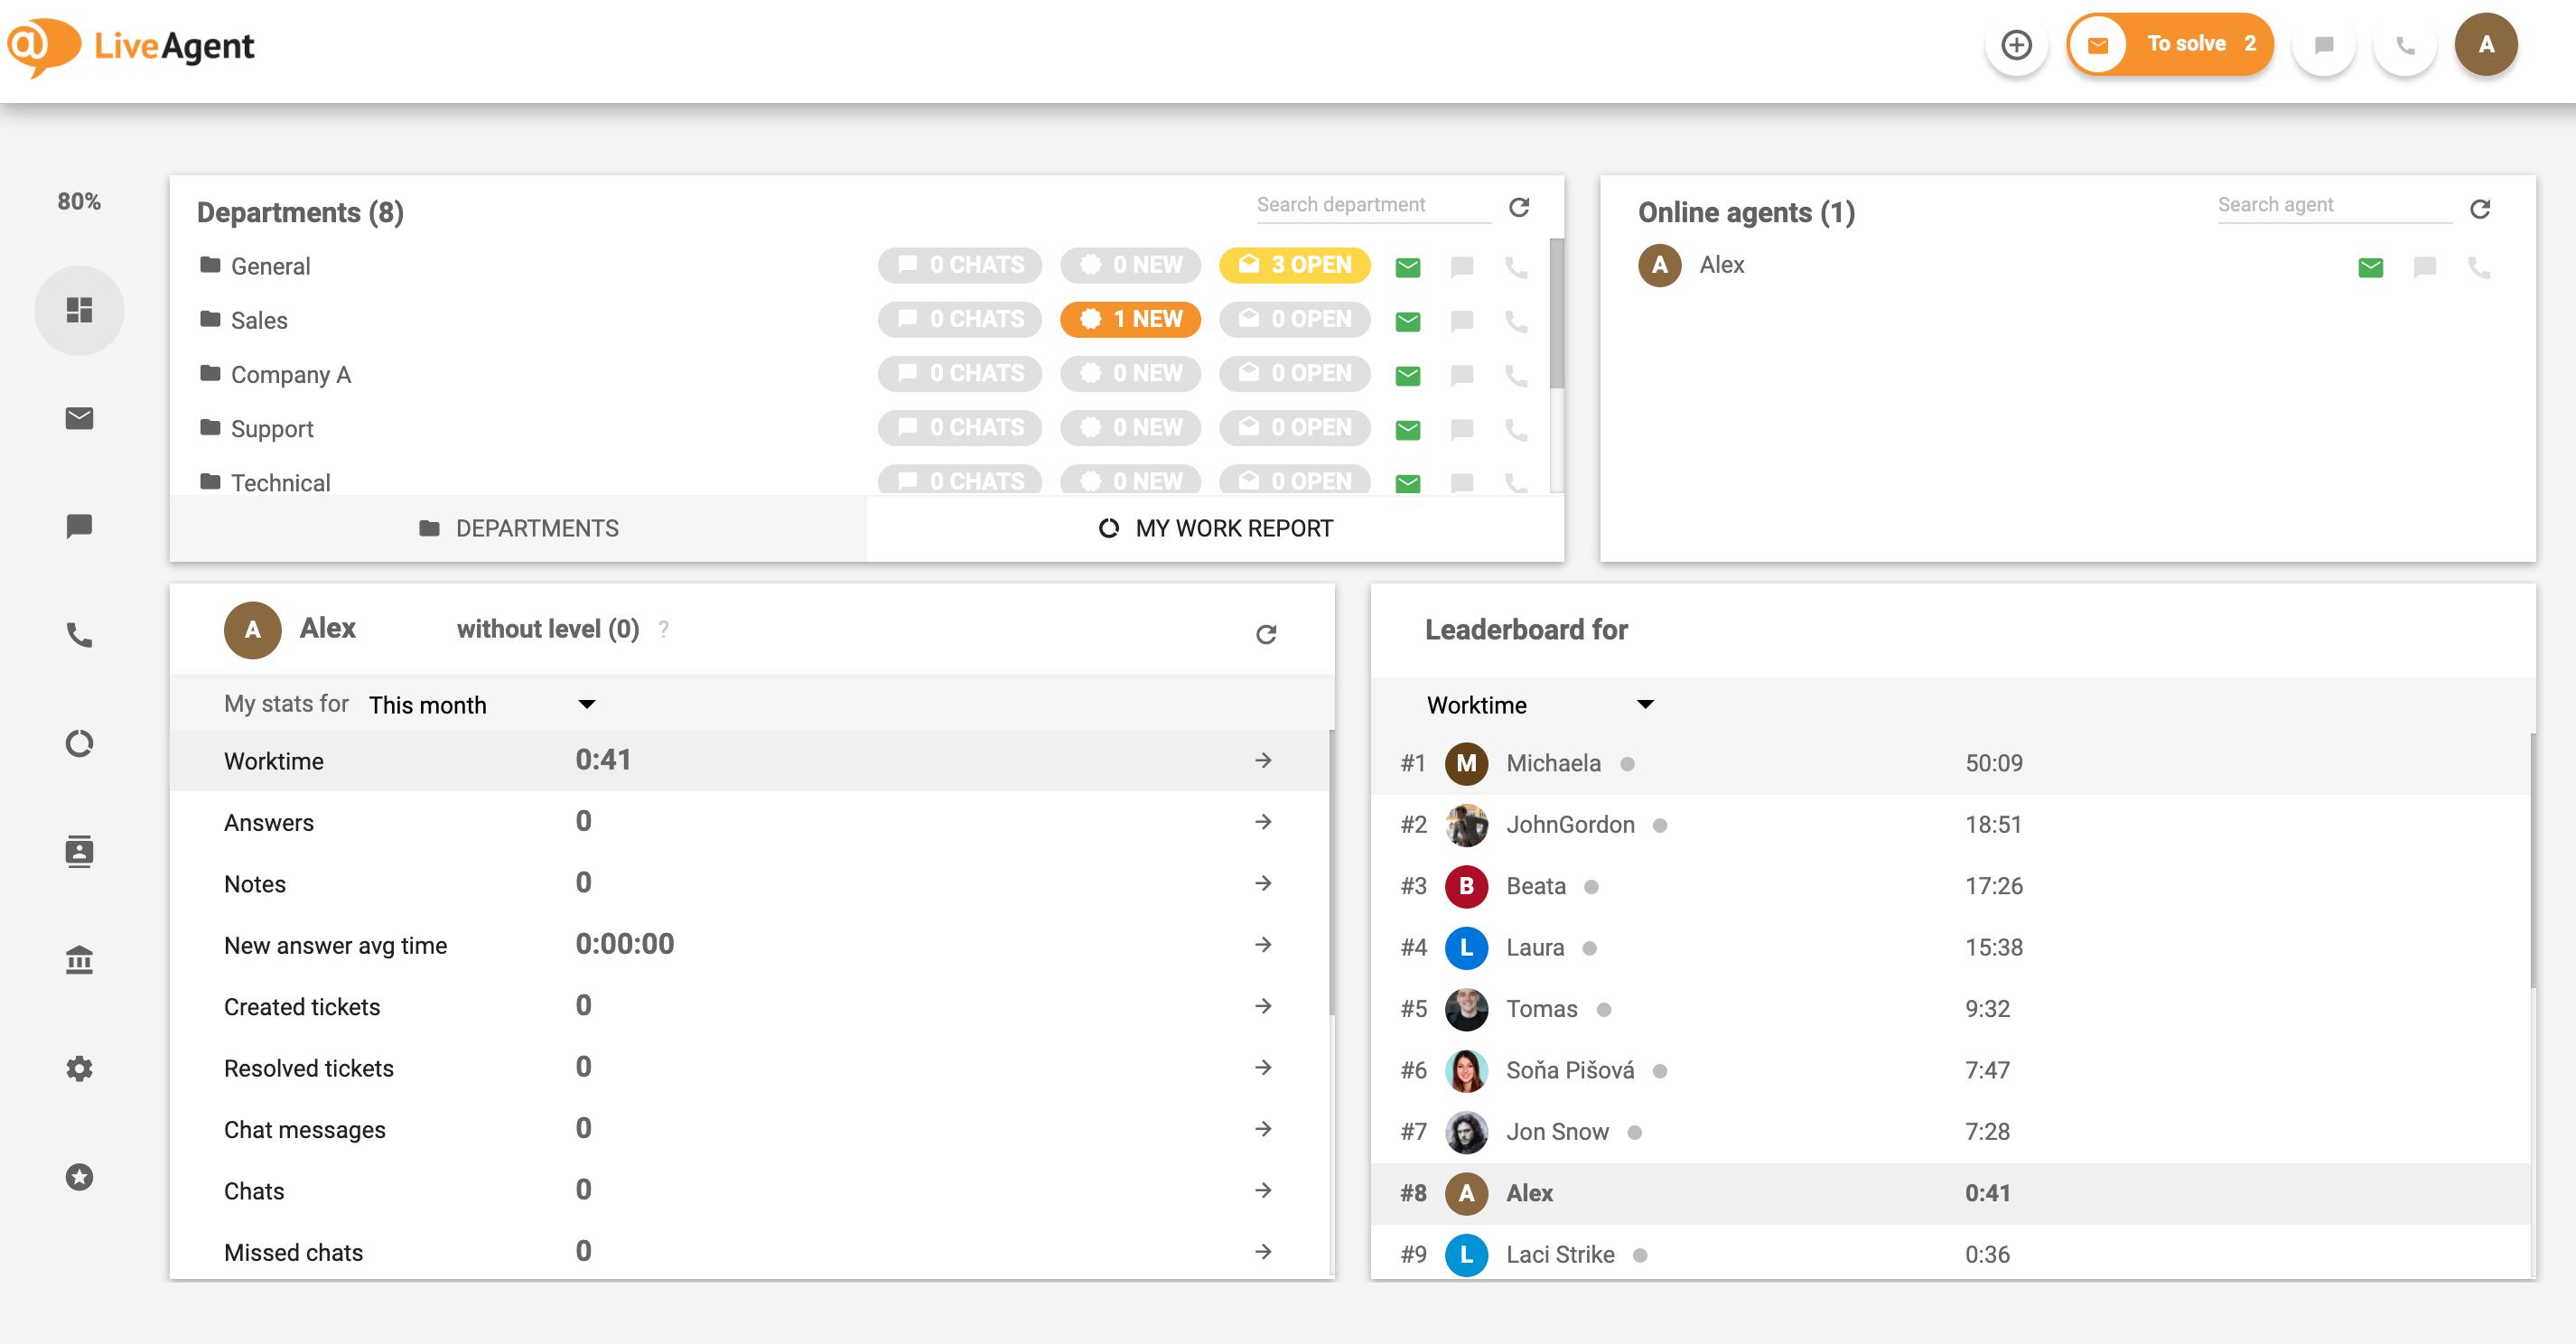 LiveAgent - Create customer value with help desk